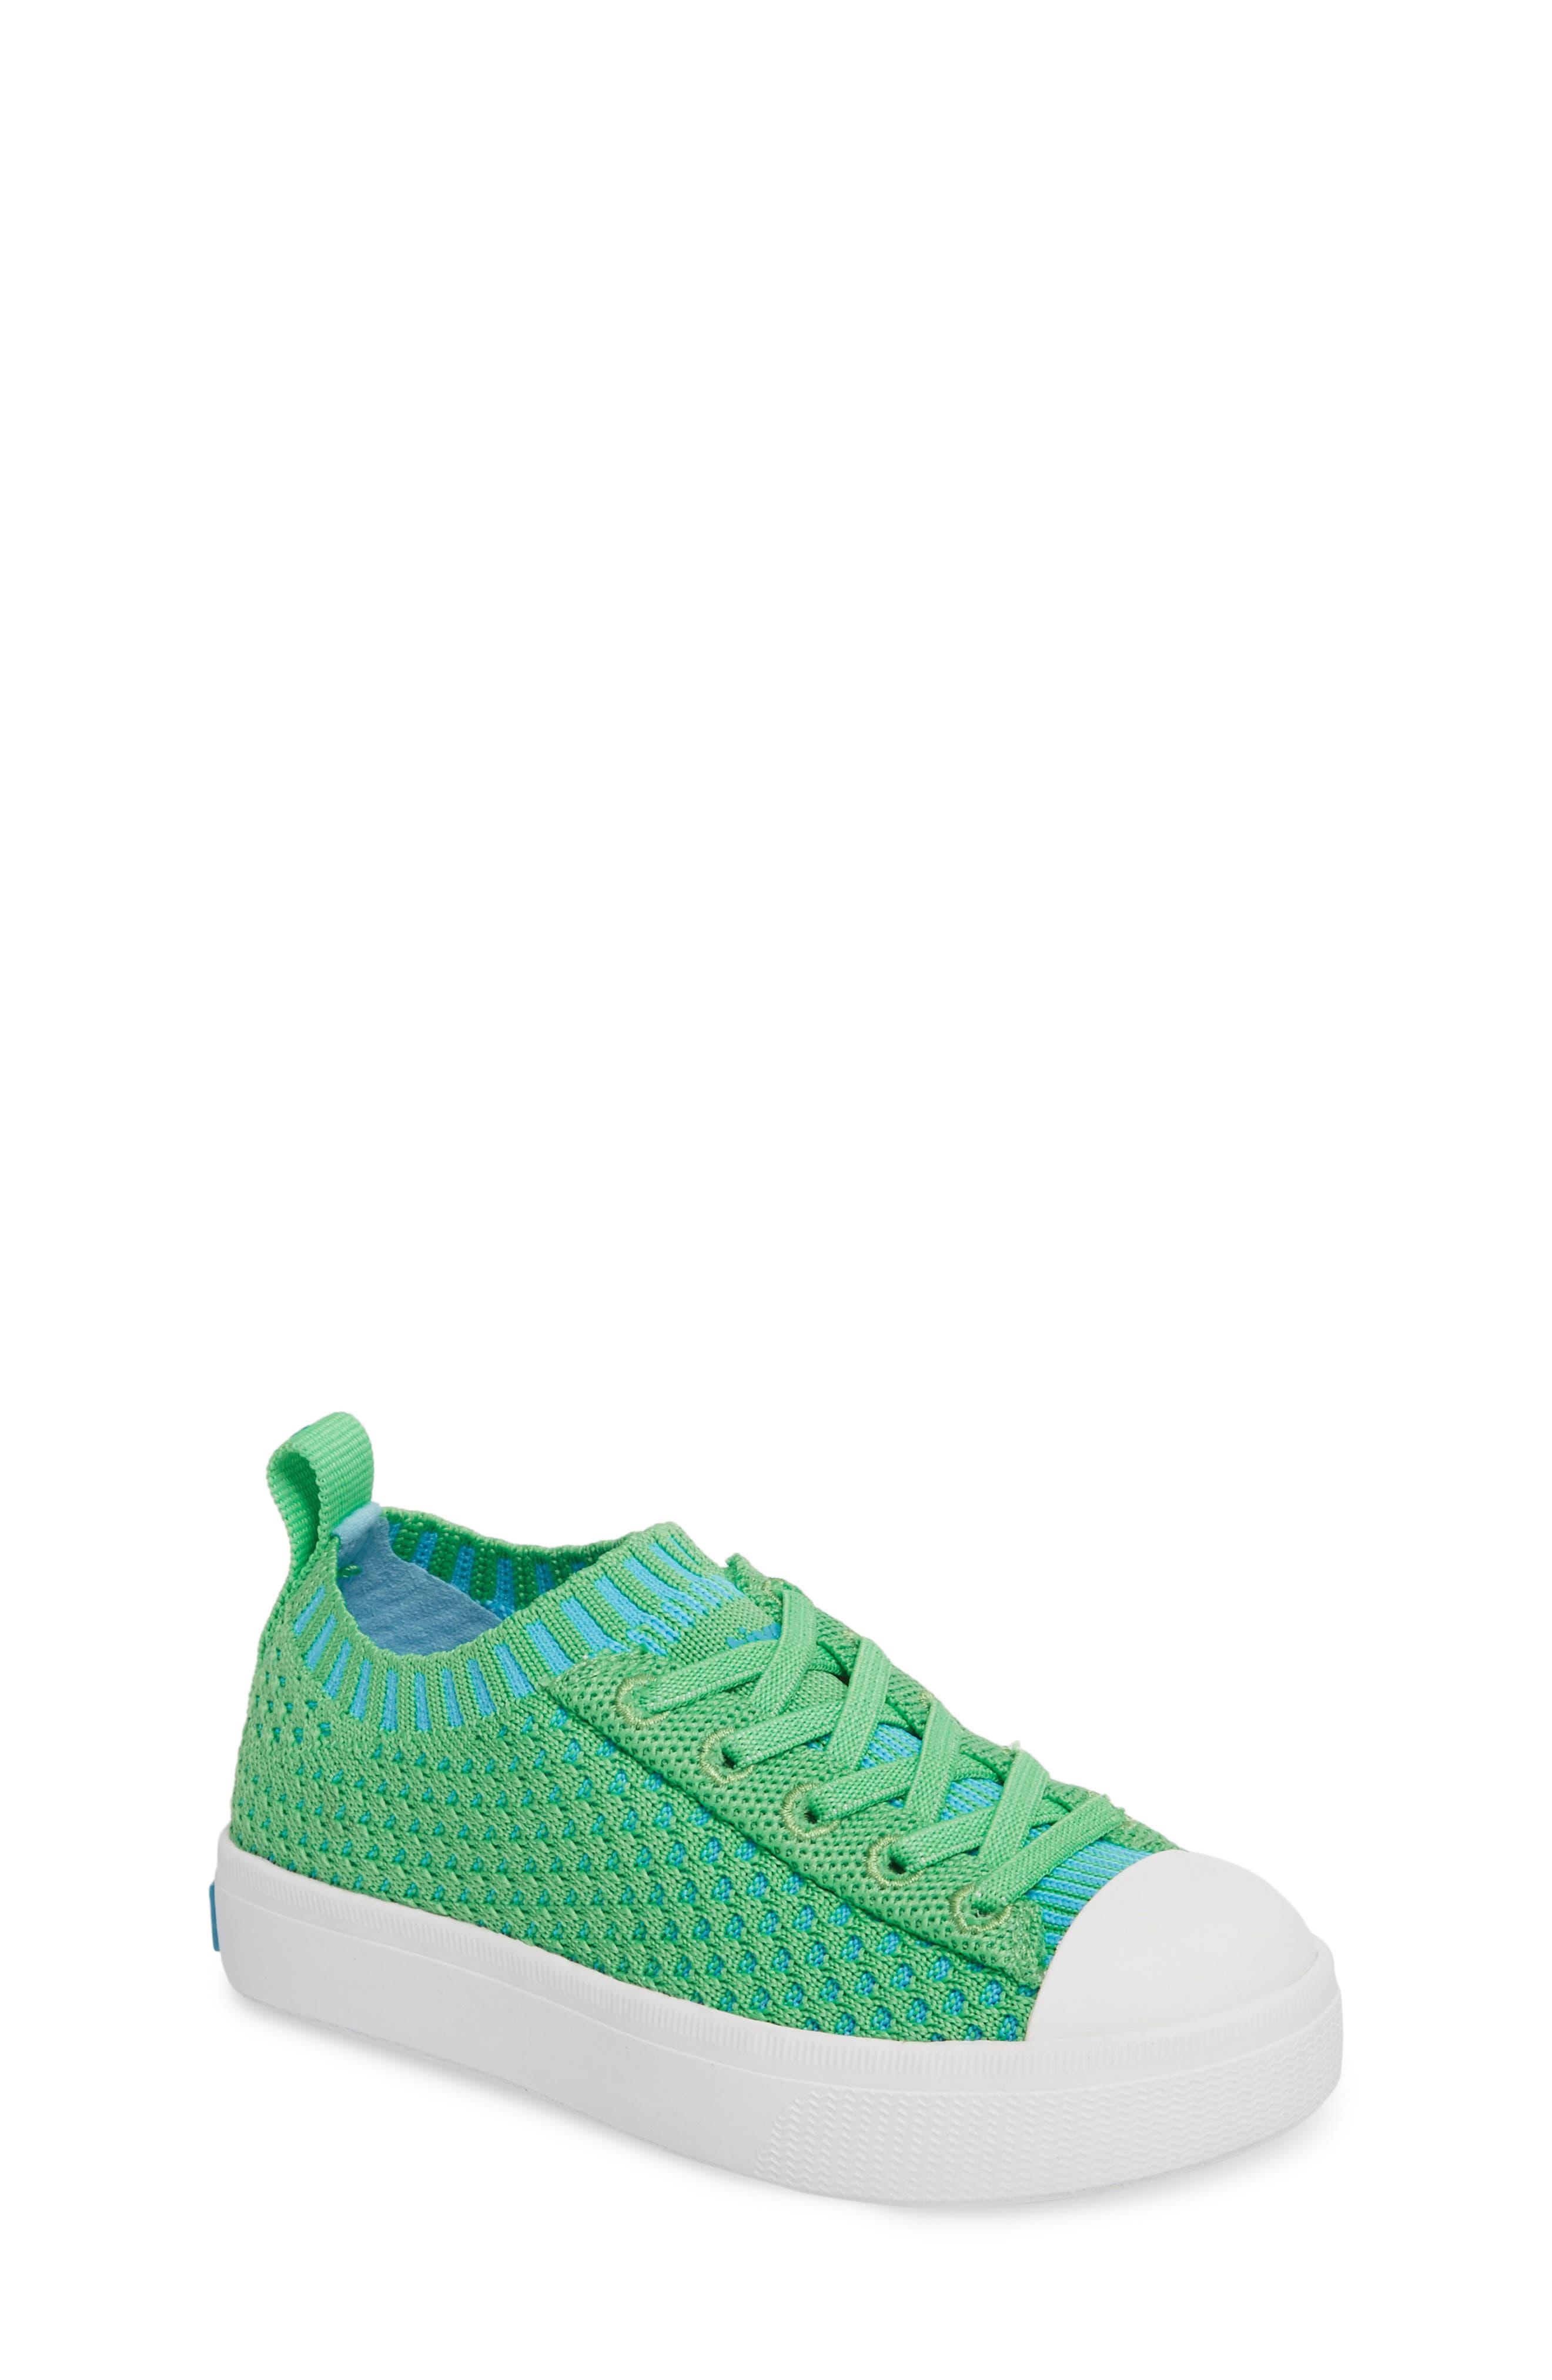 Native Jefferson 2.0 LiteKnit Sneaker (Walker, Toddler & Little Kid). GRASS  GREEN/ SHELL WHITE ...